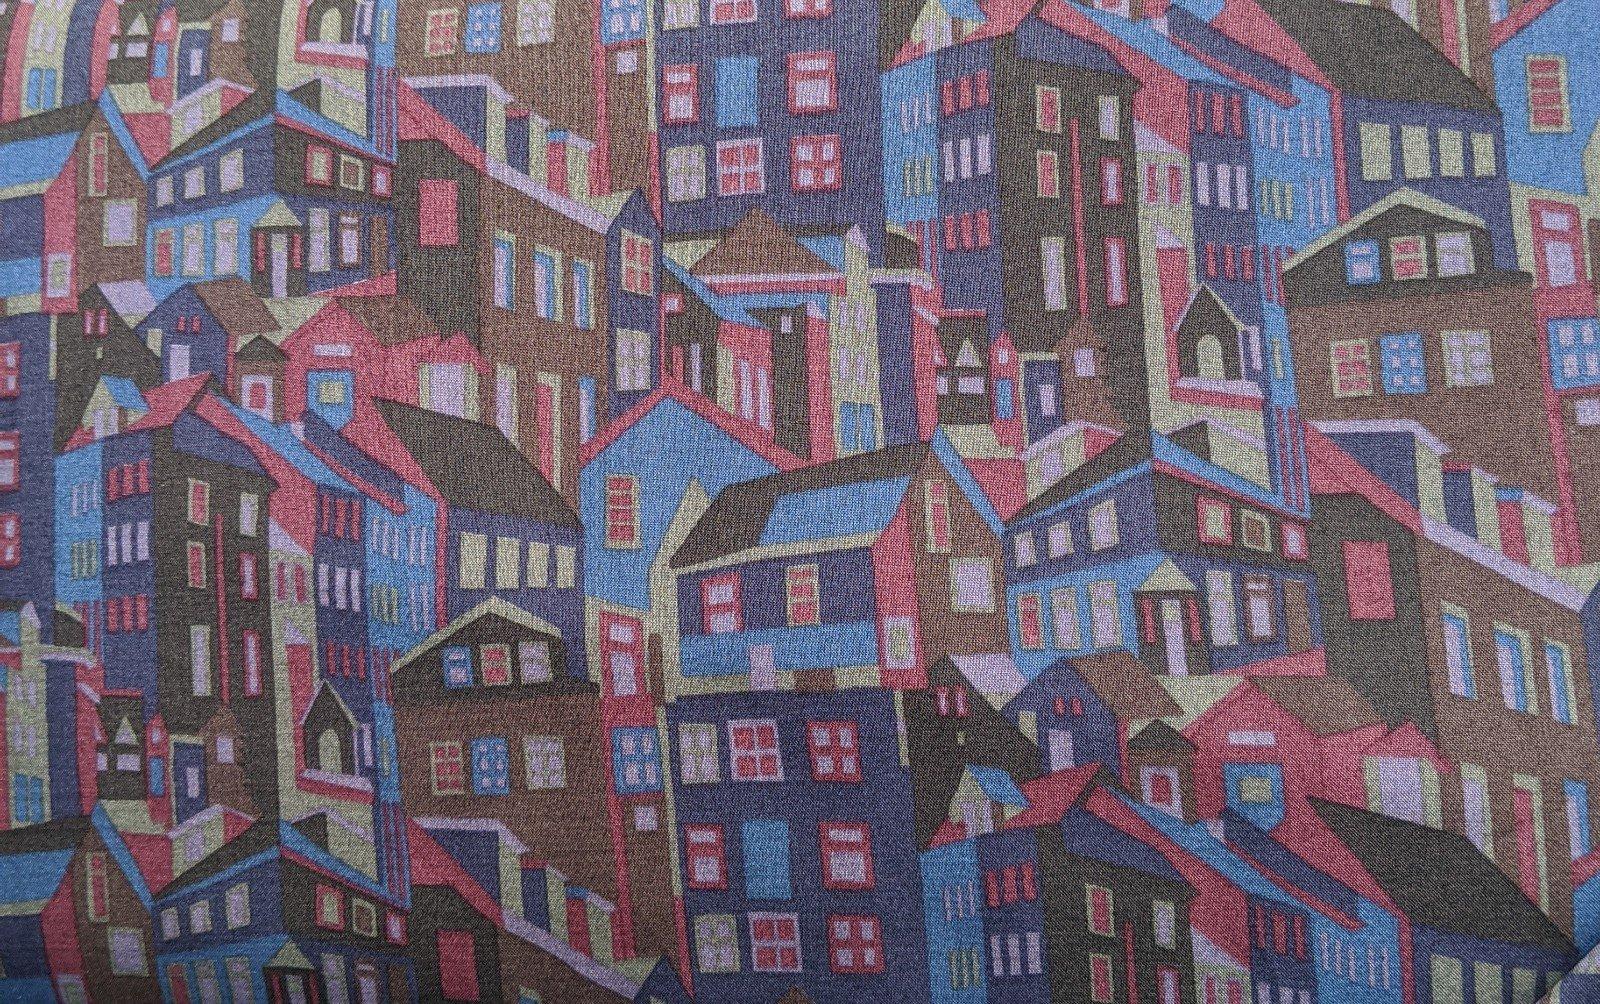 Liberty of London Cotton Lawn - Houses